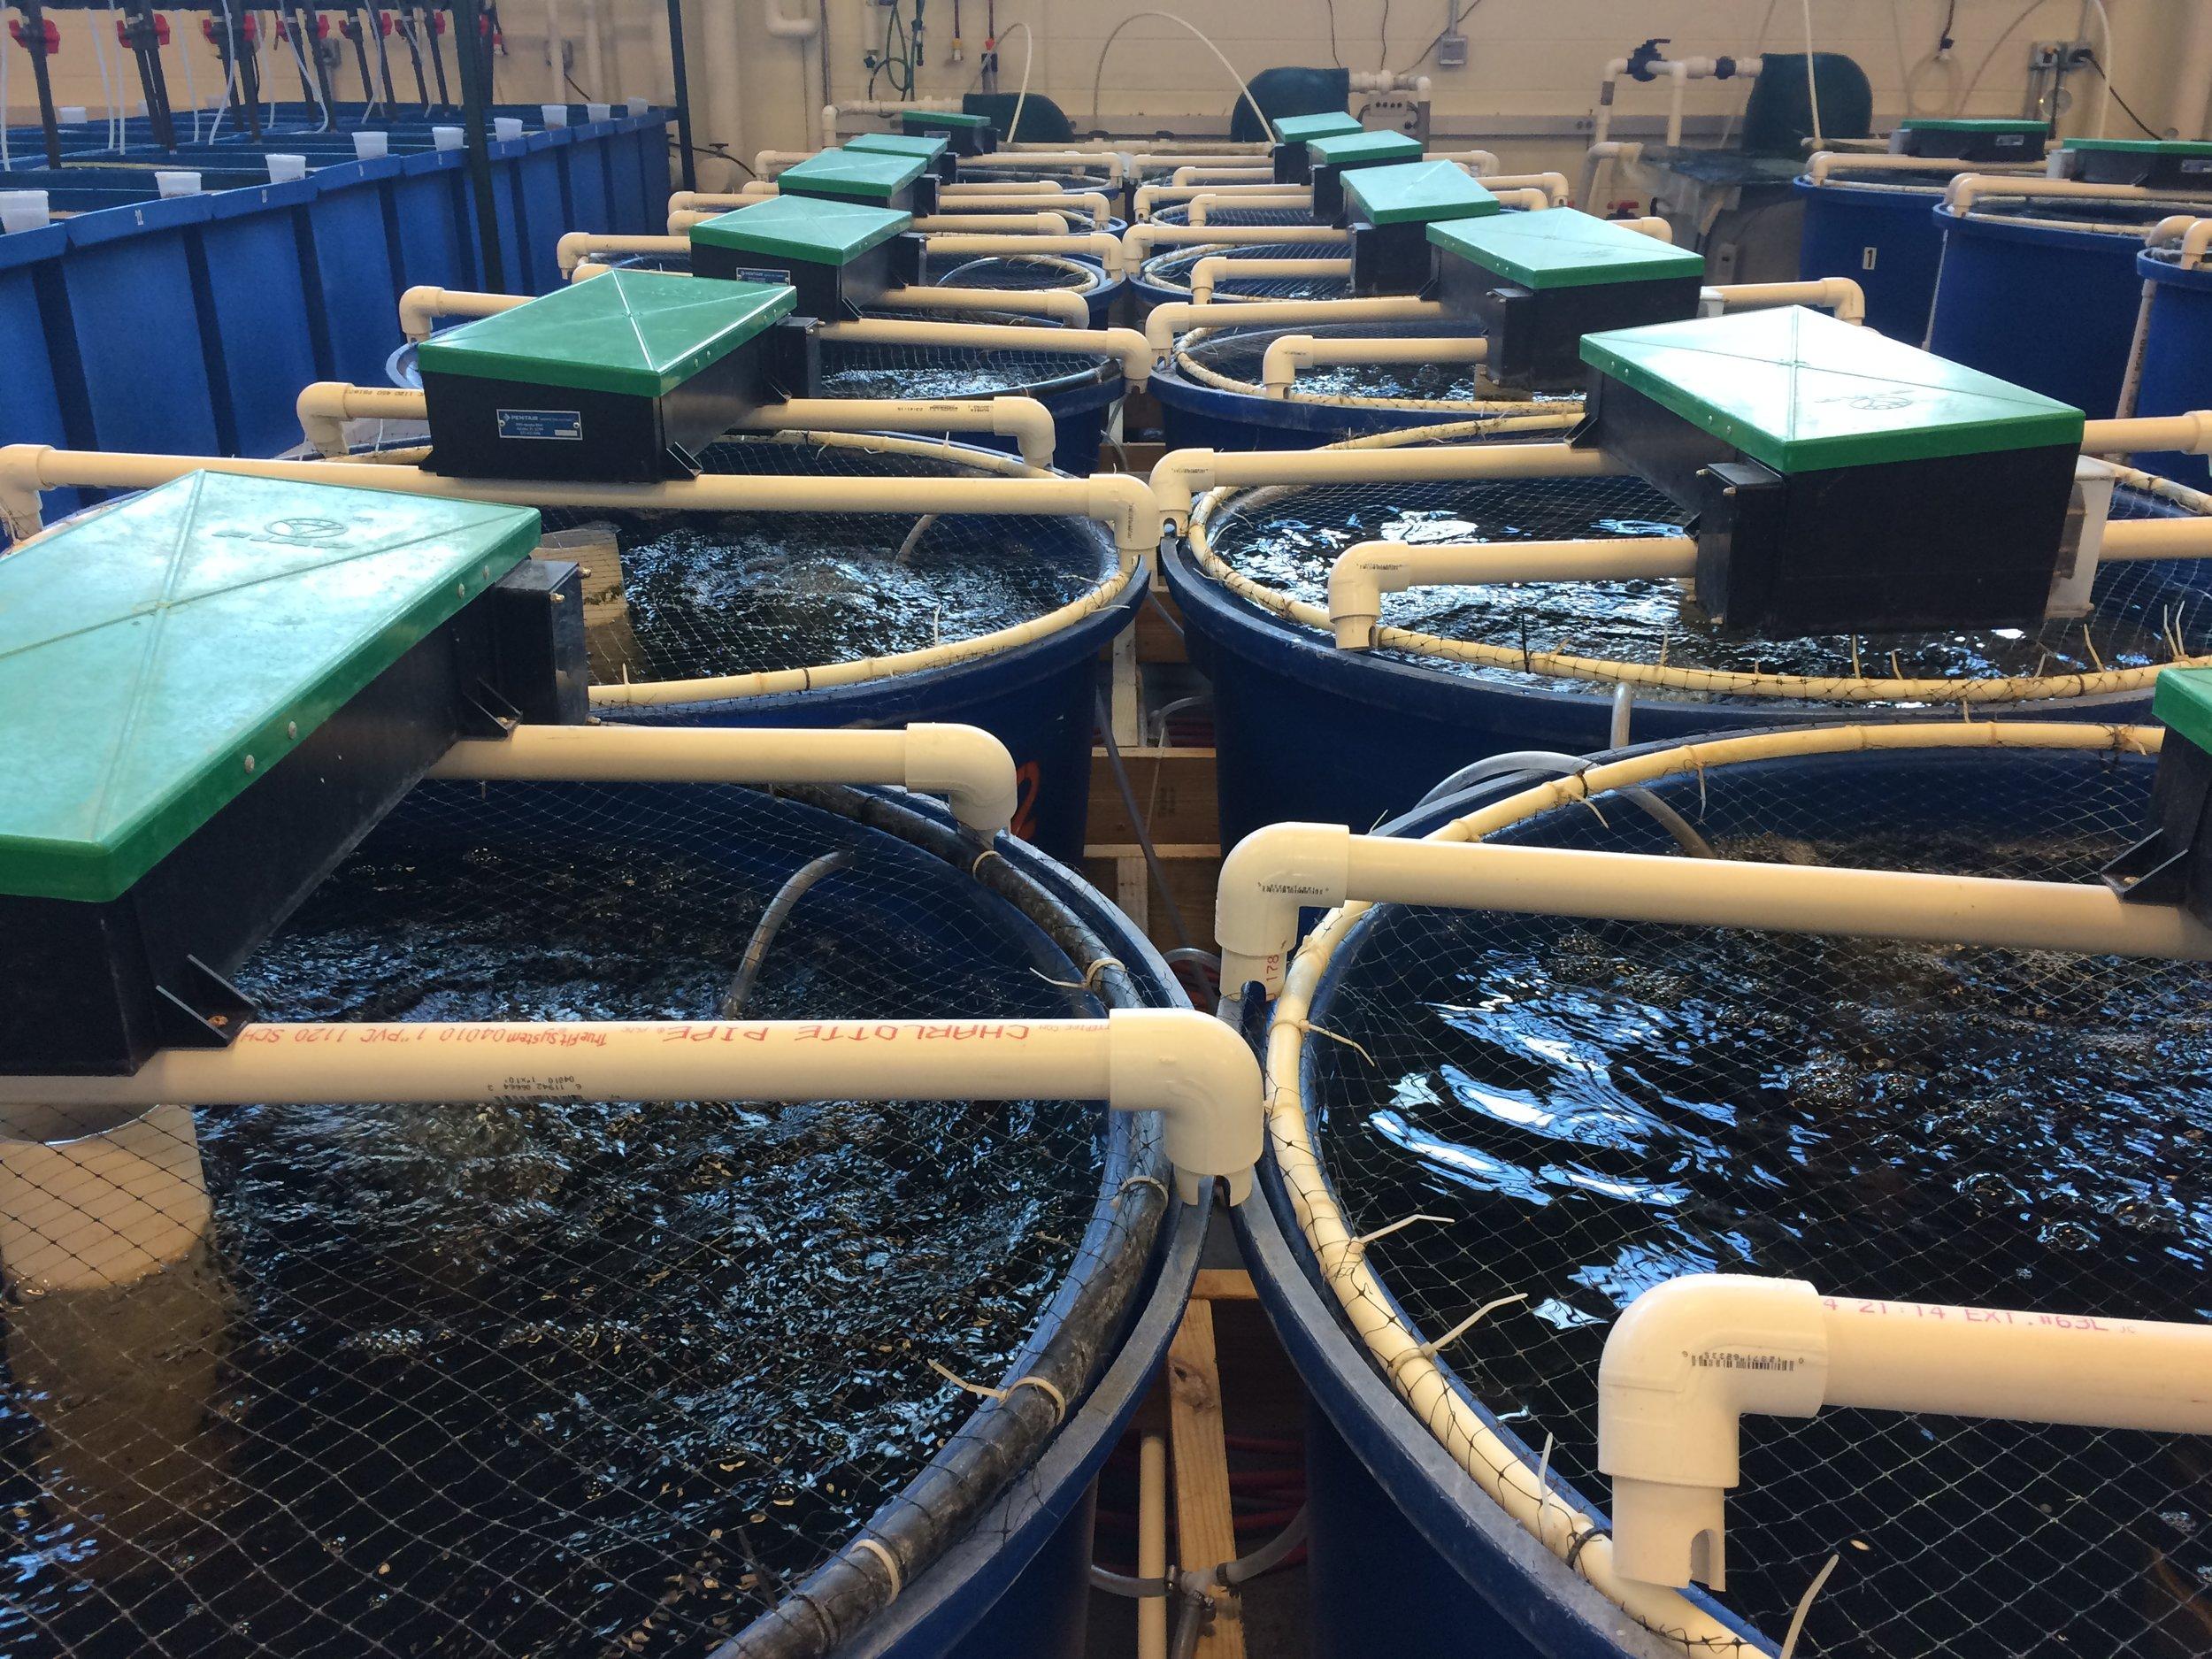 Example of a Recirculating Aquaculture System. Credit  Narek75/Wikimedia (CC BY-SA 4.0)